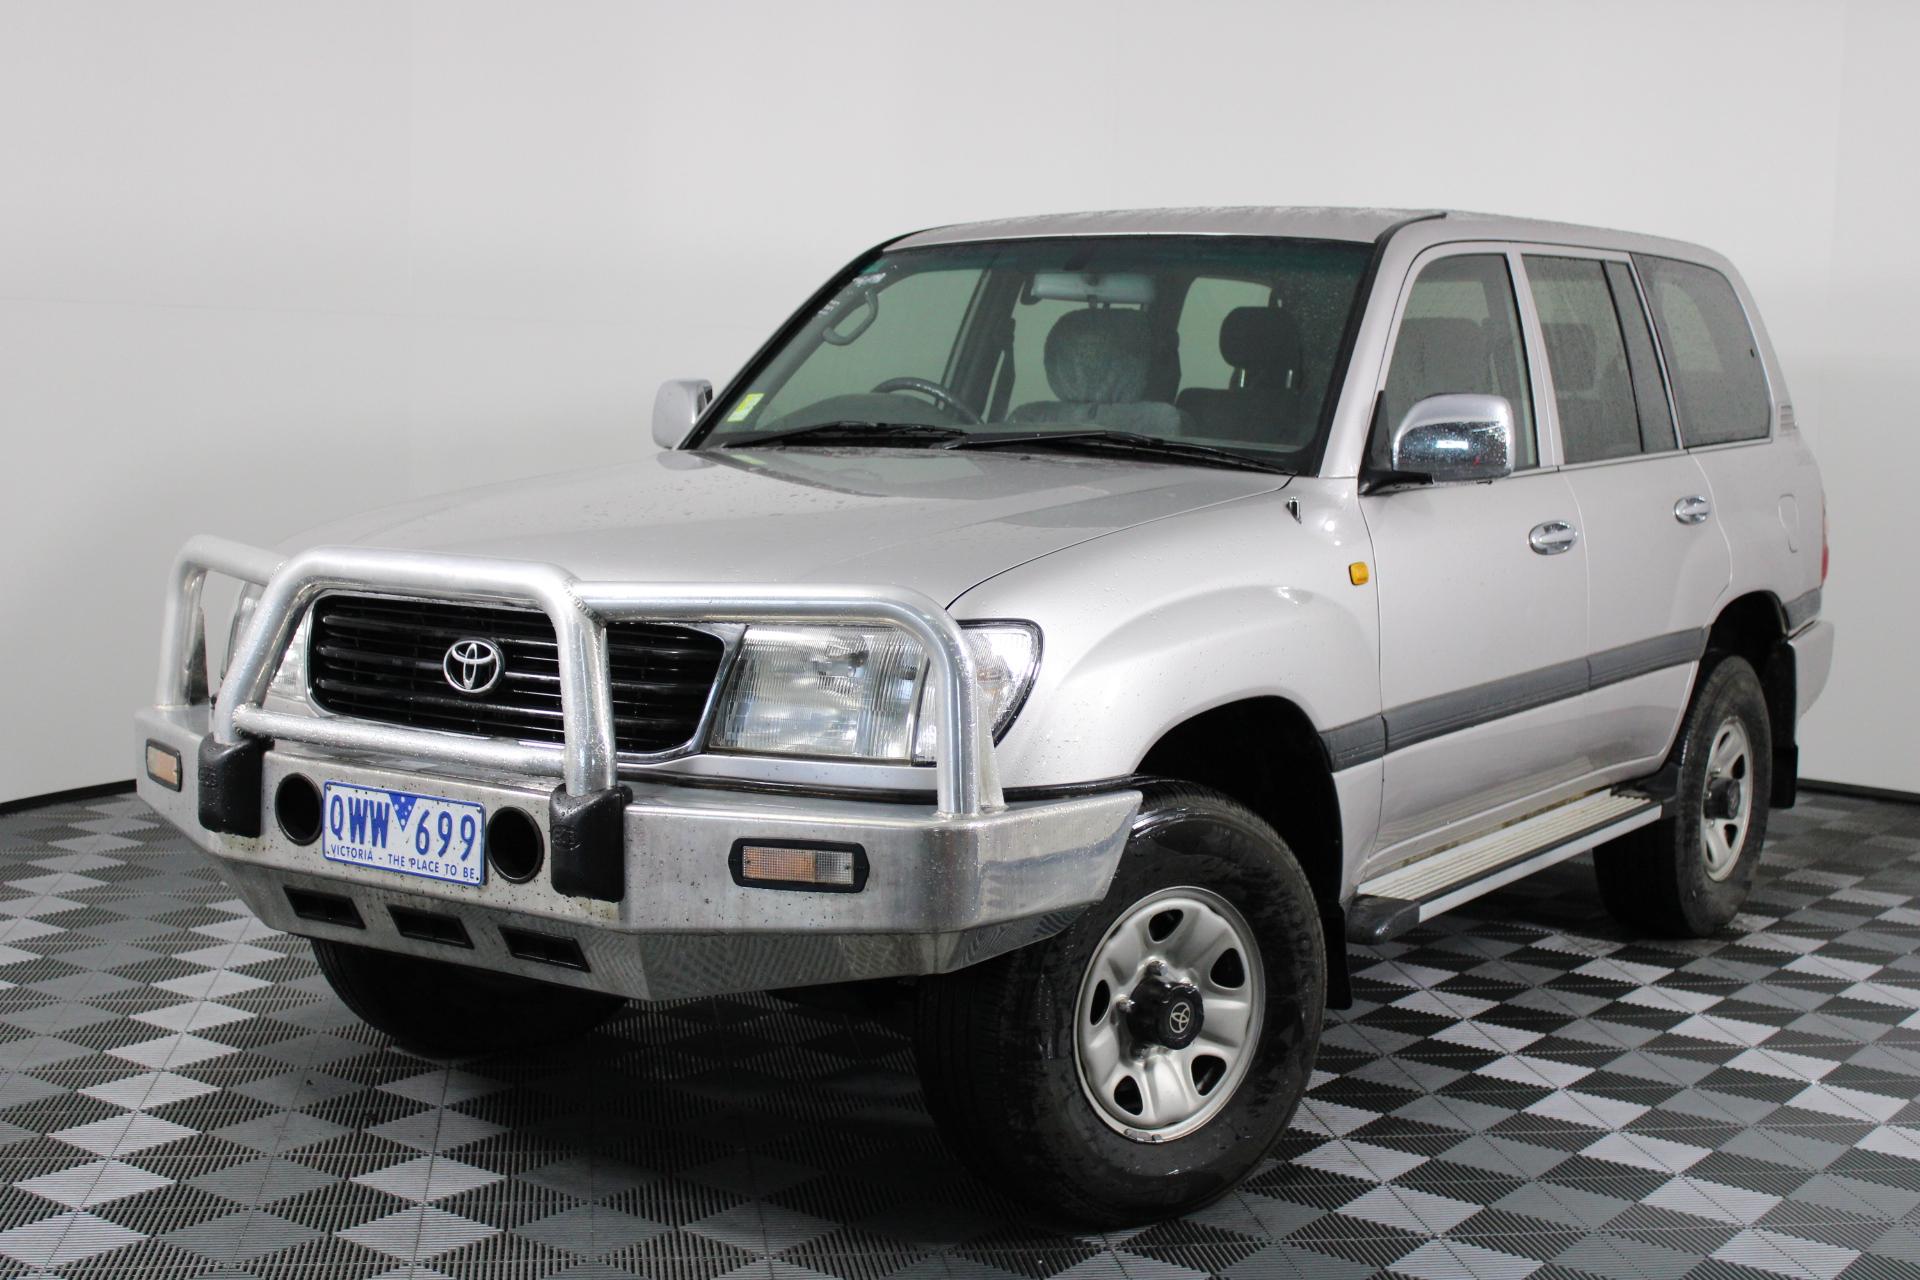 2001 Toyota Landcruiser GXL (4x4) HDJ100R Turbo Diesel Auto 8 Seats Wagon